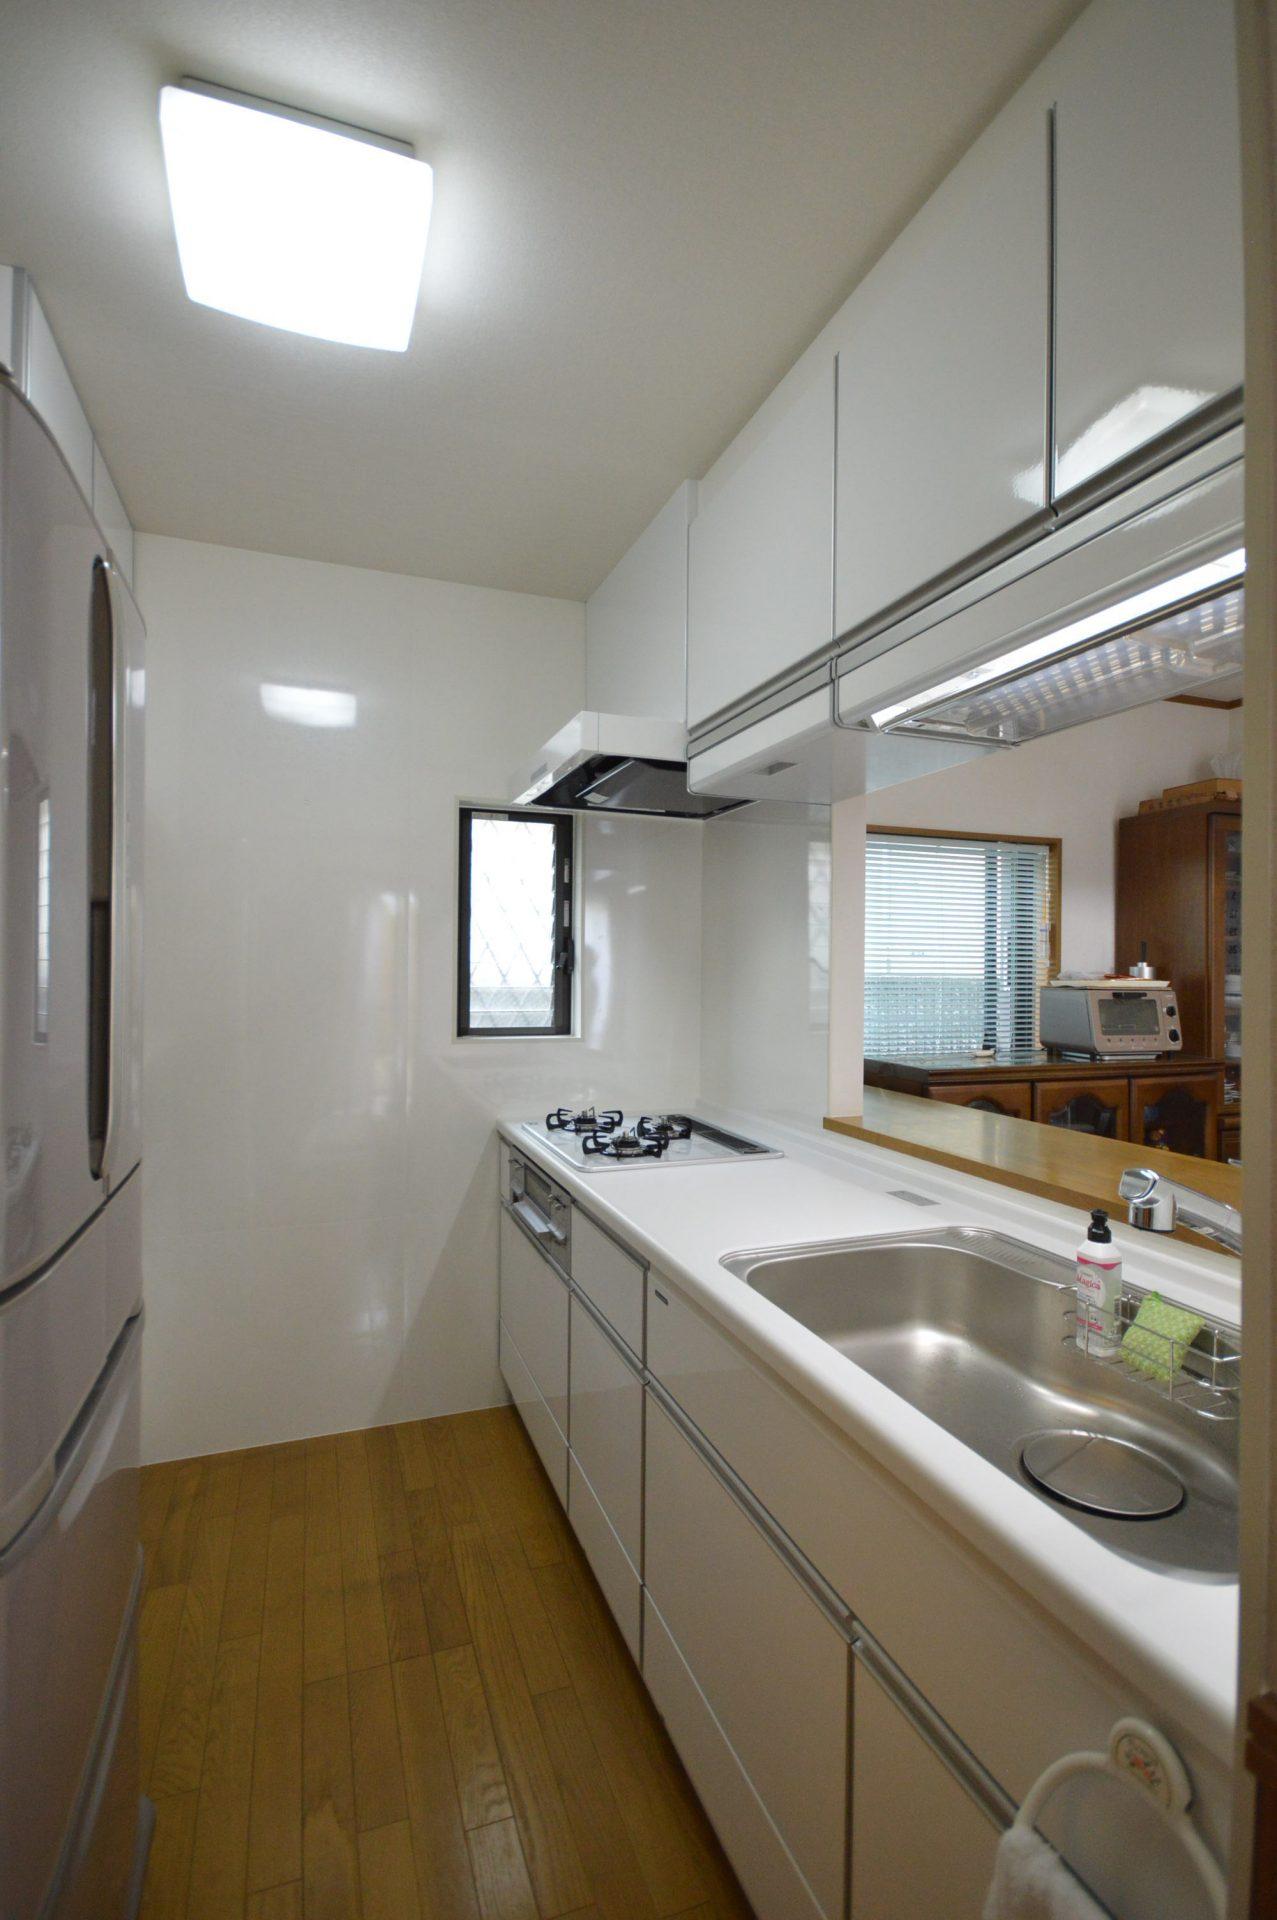 after:無駄なスペースがなくり広々したキッチンへ